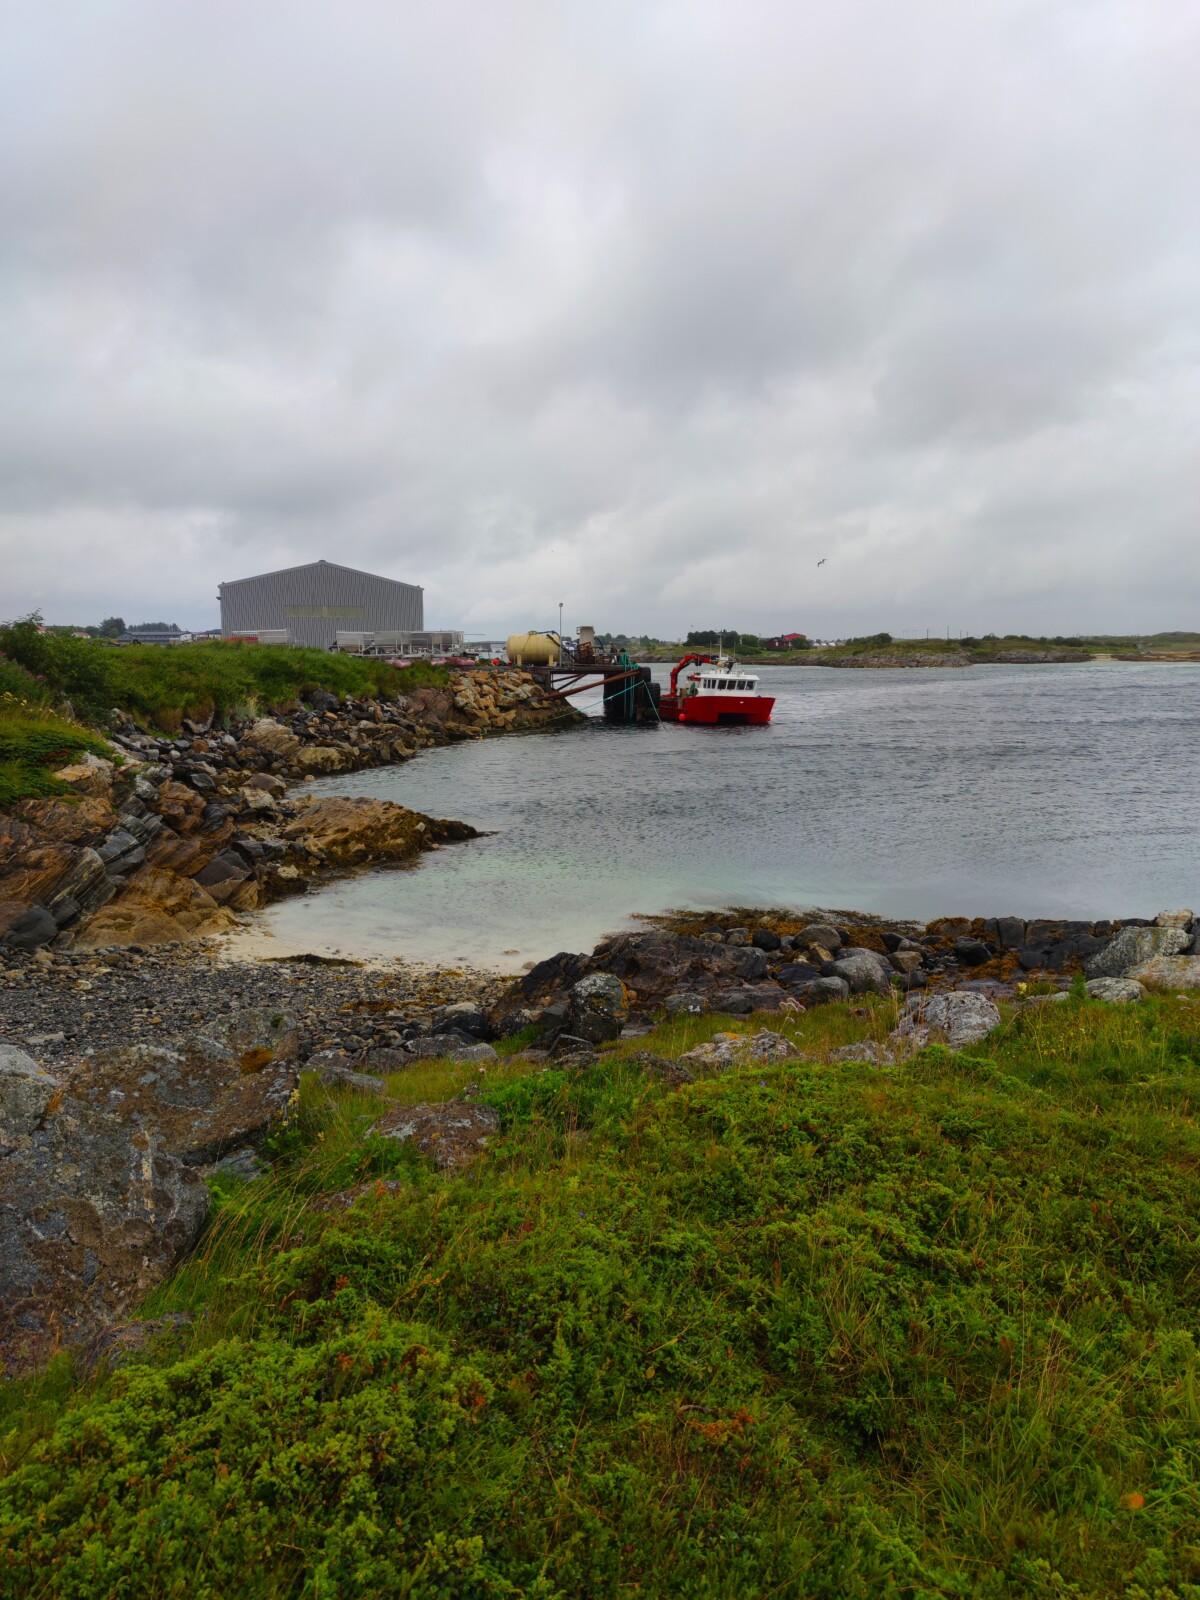 bildedryss-bilder-nordnorge-nord-norge-seløy-seløya-helgeland-herøy-sandnessjøen-mosjøen-natur-norge-norway-northofnorway-trondheim-vakkernatur-isalicious-klartvann-strang-norgesommer-norgessommer-sommer-helgelandskysten-isalicious.blogg.no-natur-fjell-strand-sjø-hav-fiske-fisketur-skolo-middag-mat-pizza-laksepizza-